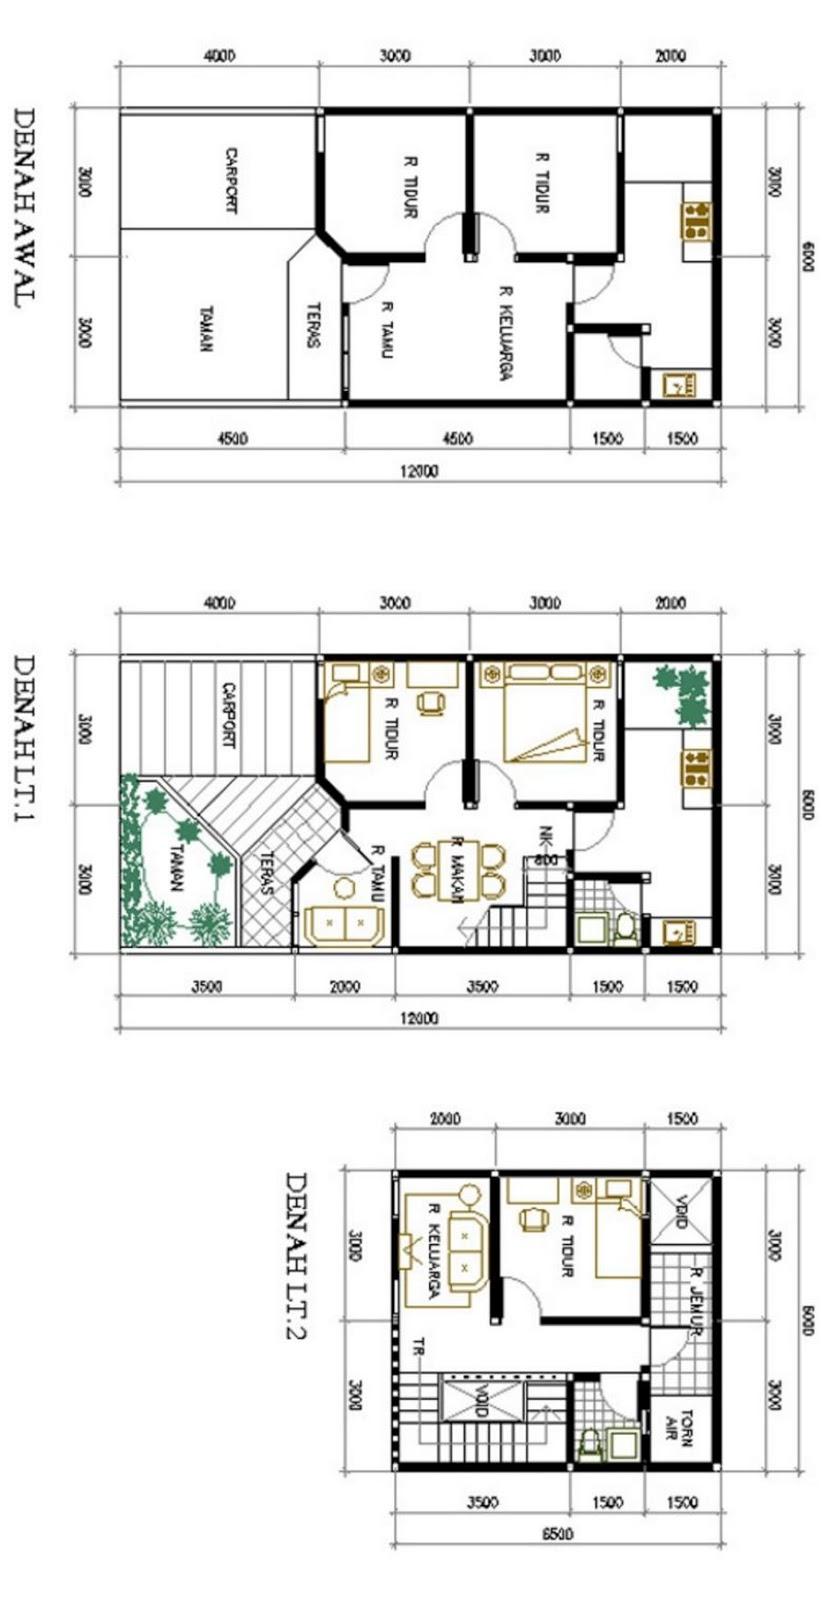 contoh denah 2 lantai 6x12 terbaru